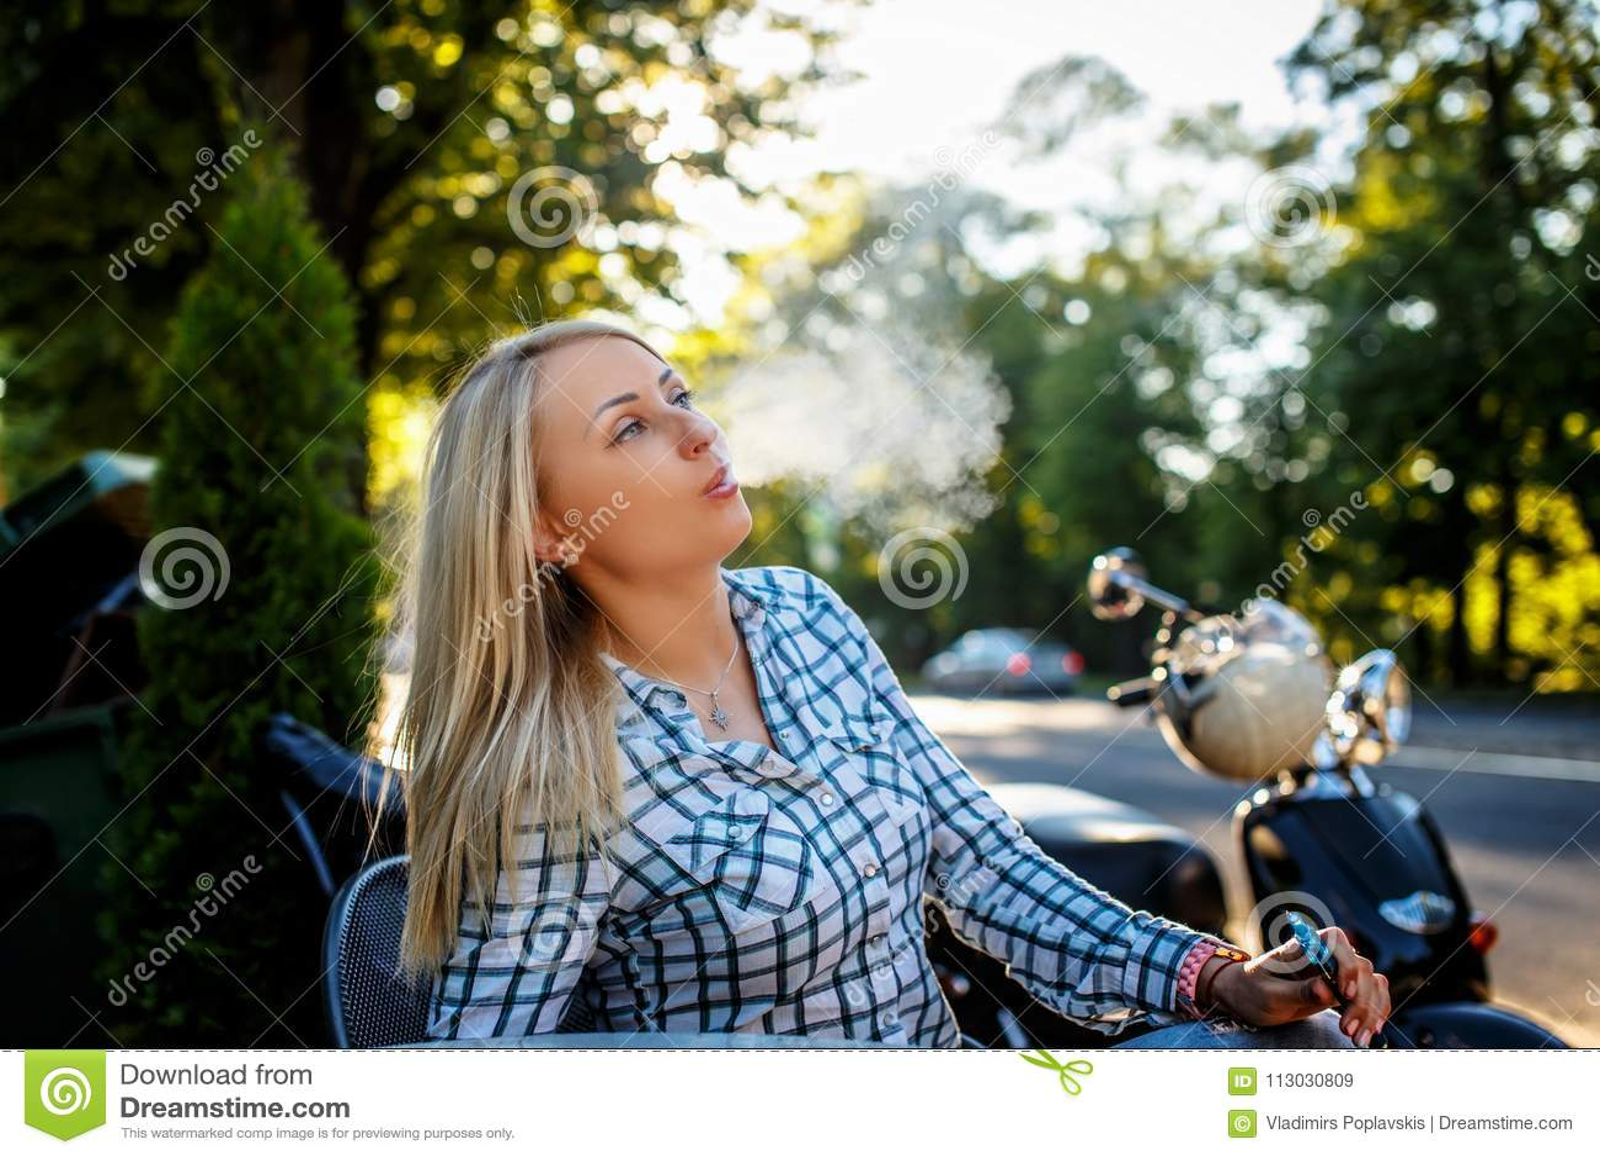 Cigarrillo que fuma femenino rubio